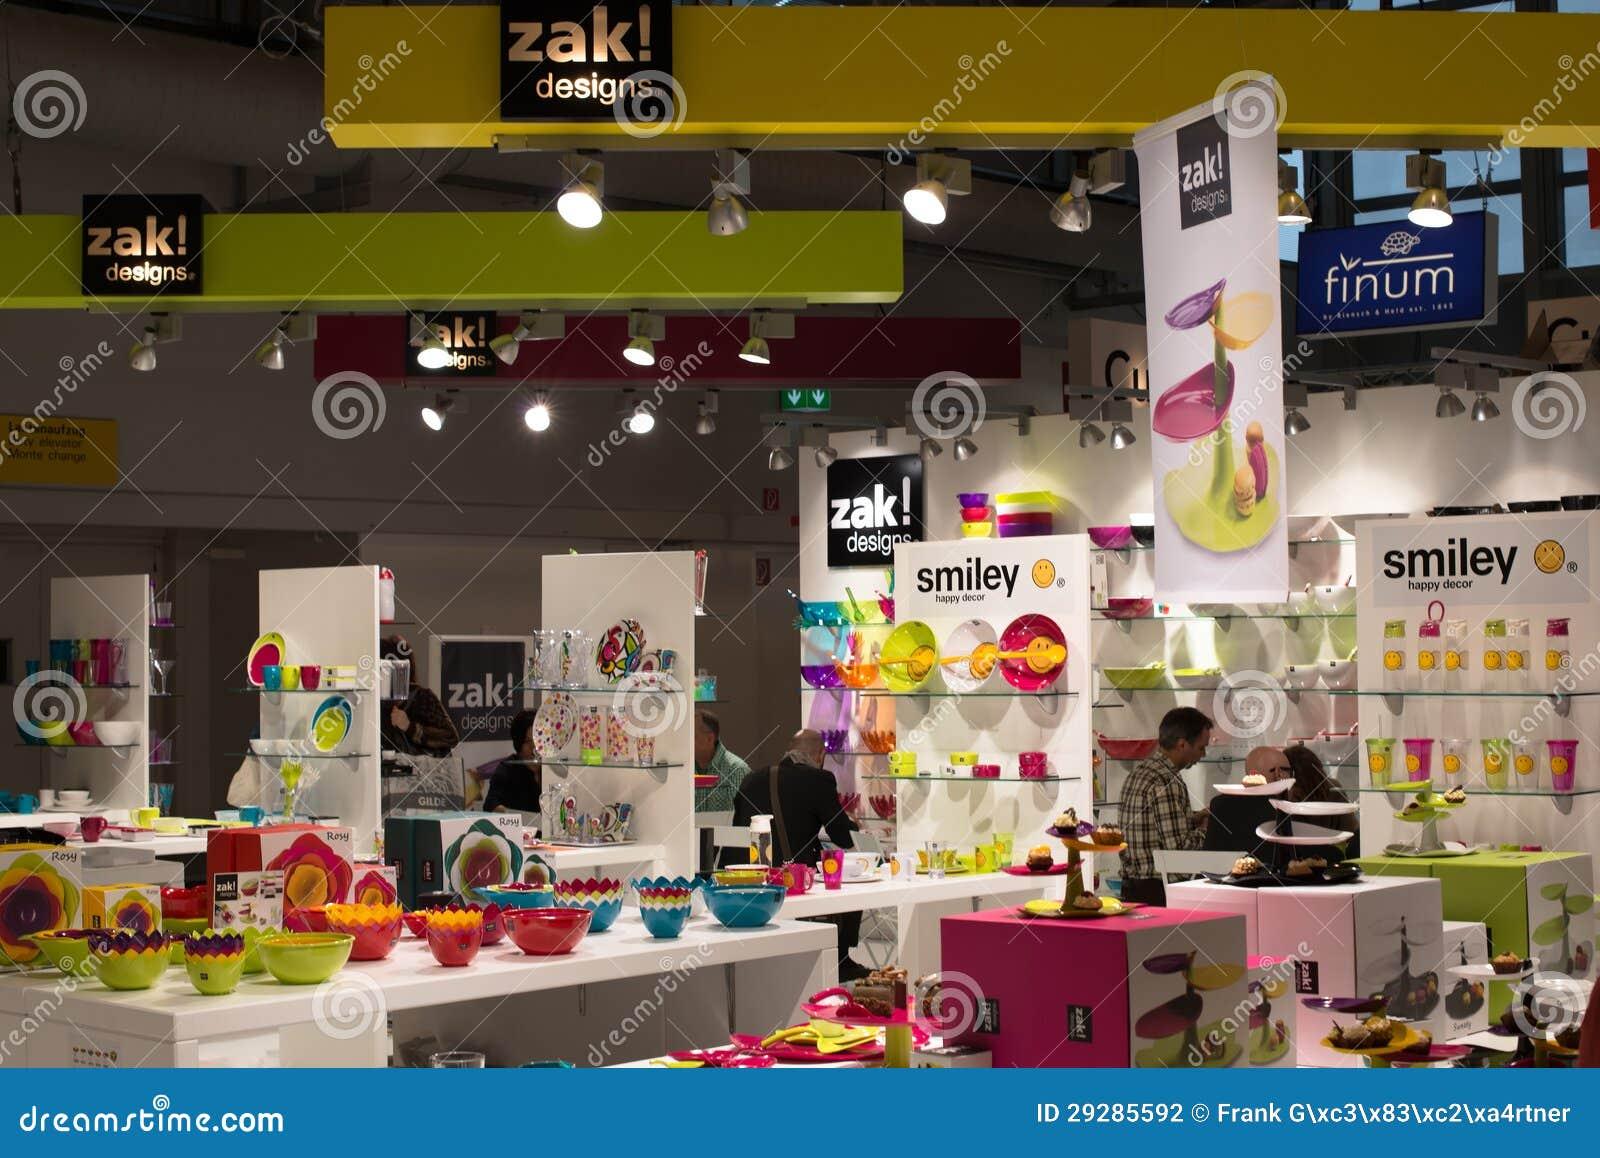 Zak designs at ambiente exhibition in franfkurt editorial for Ambiente design